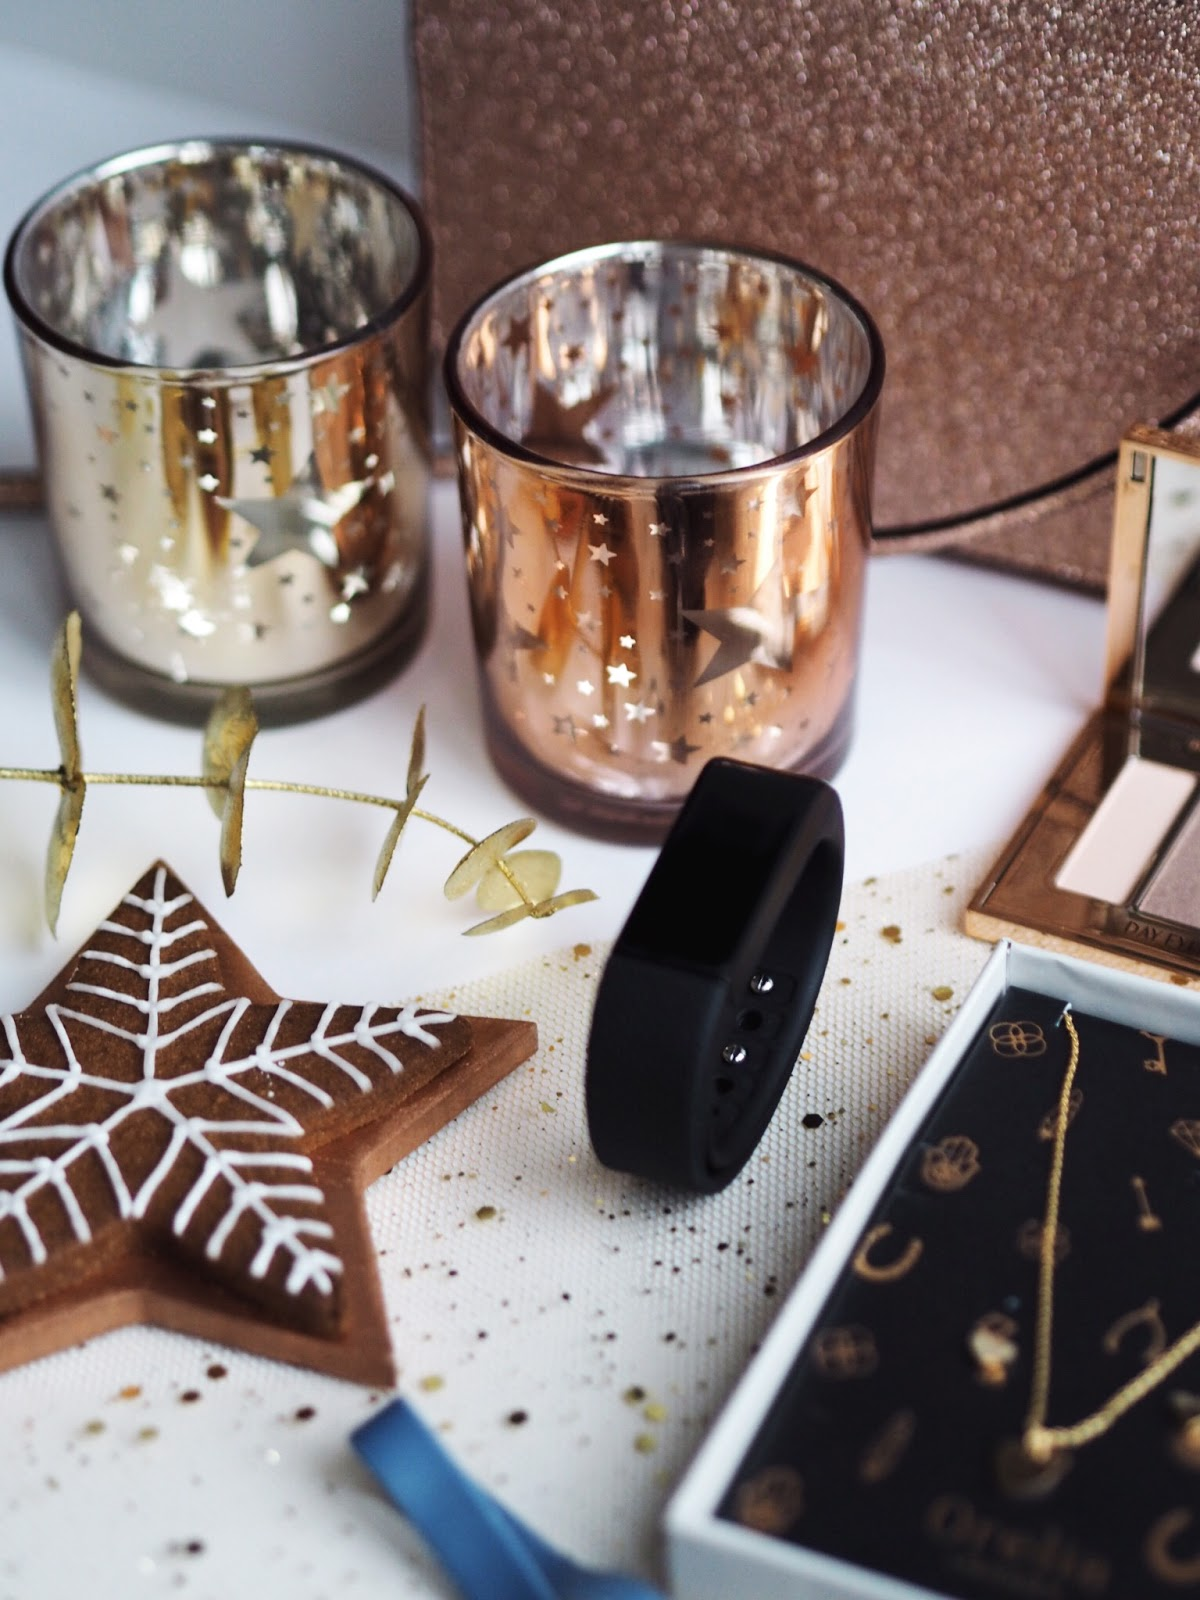 Christmas   The Christmas Gift Guide for Her 2017